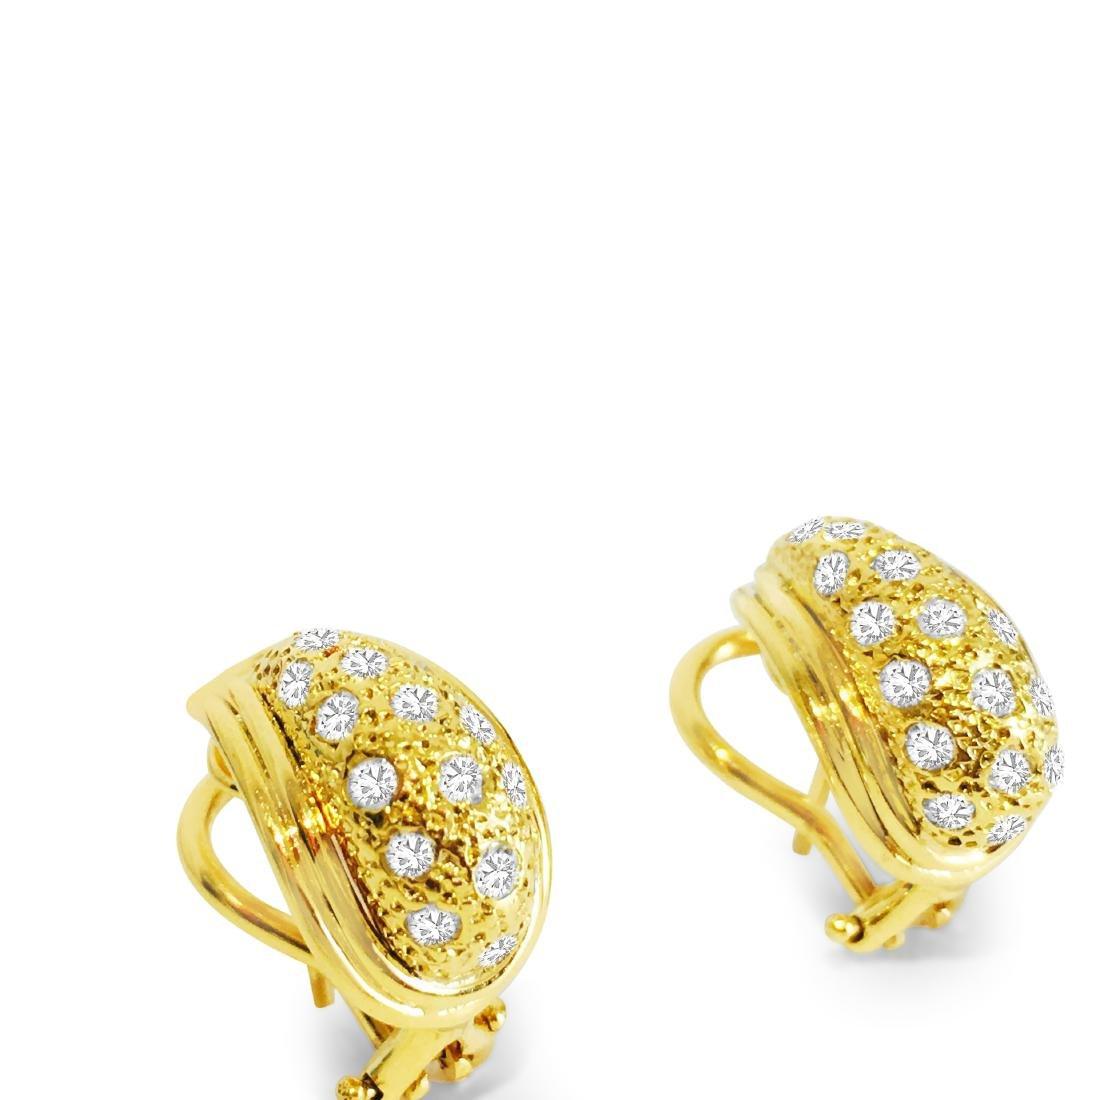 14K Yellow Gold, 1.00 CT Diamond Earrings - 3